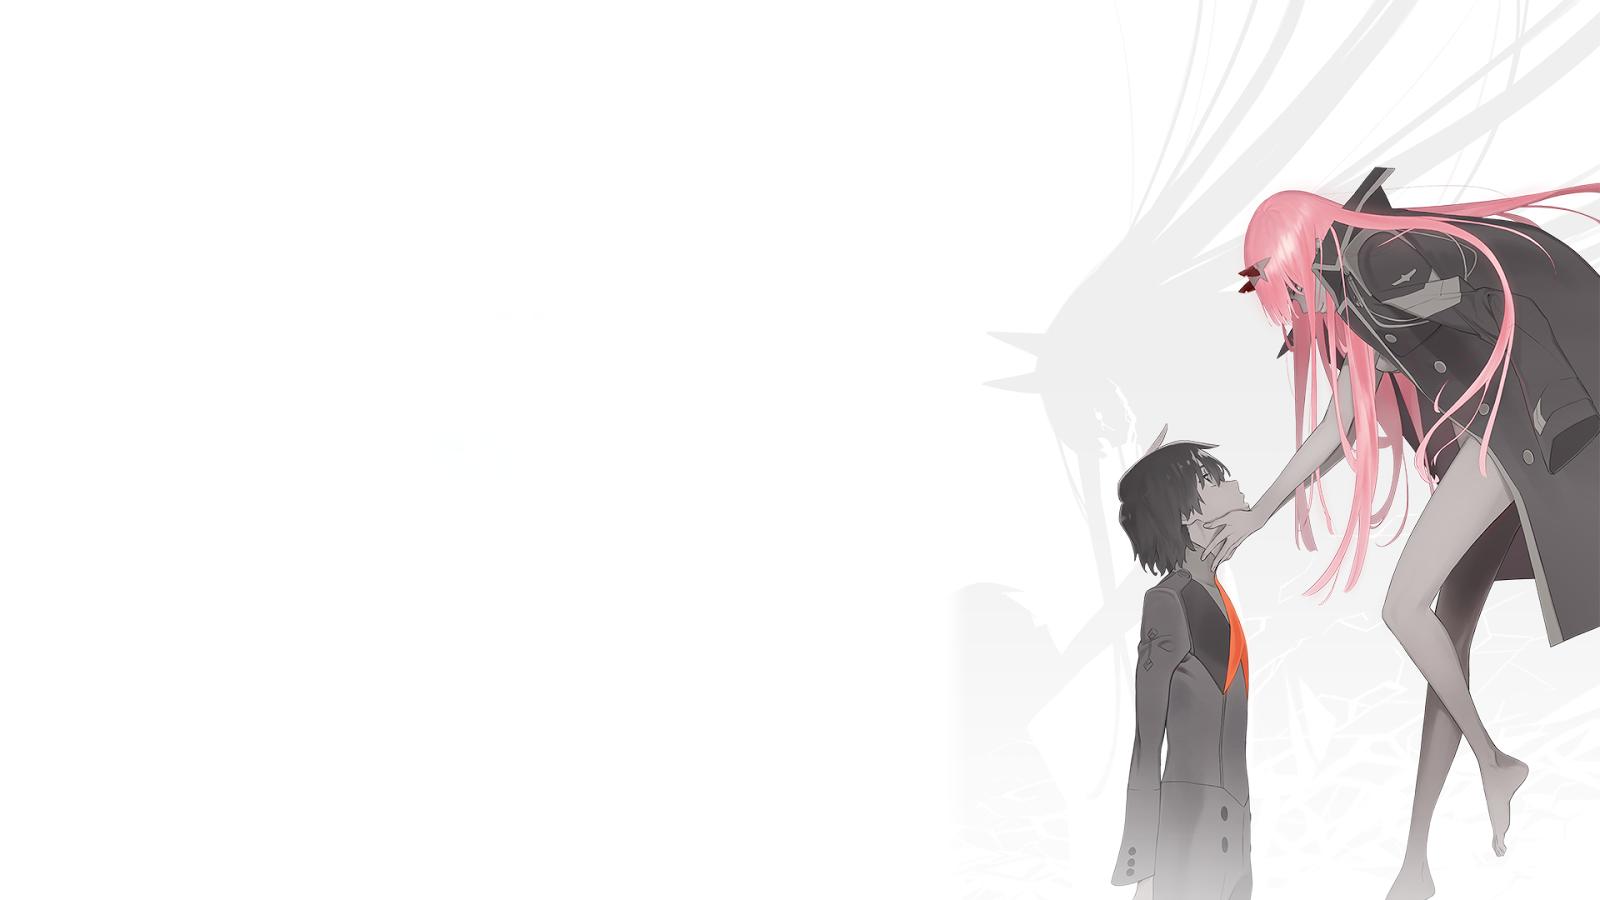 Sinopsis Anime Darling In The Franxx